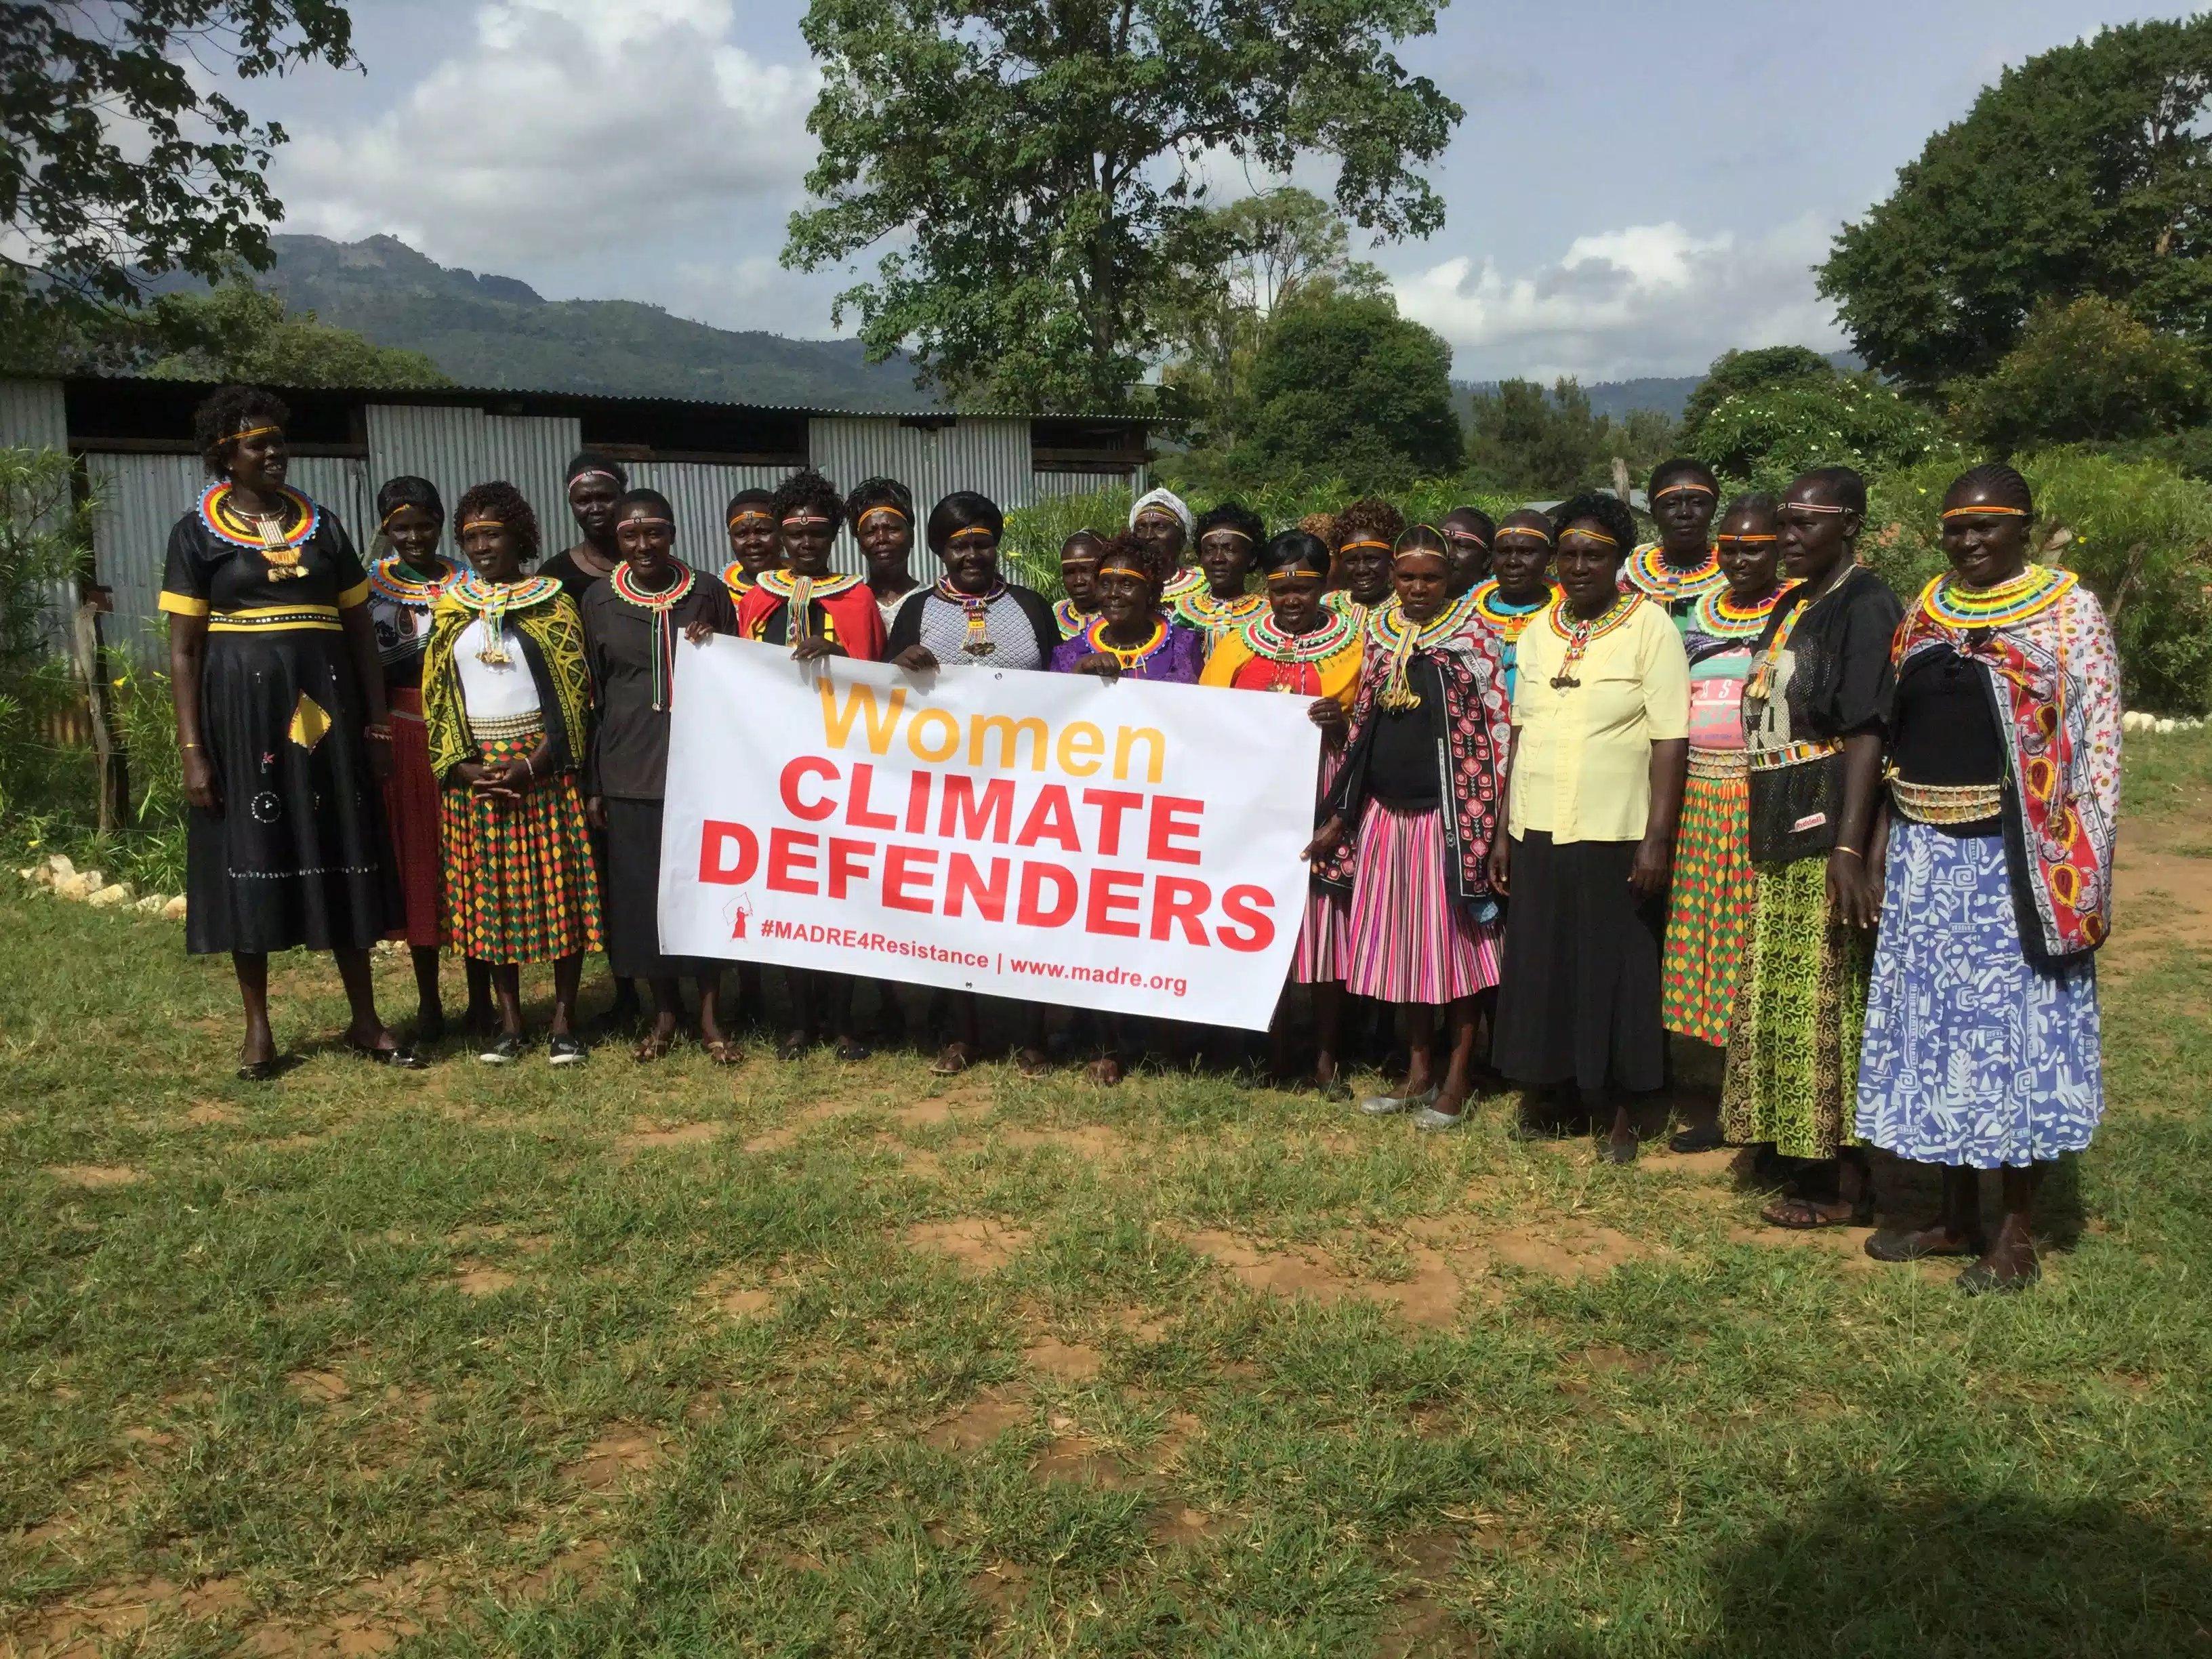 http://indigenouswomen-africa.org/wp-content/uploads/2018/03/image-33258.jpeg